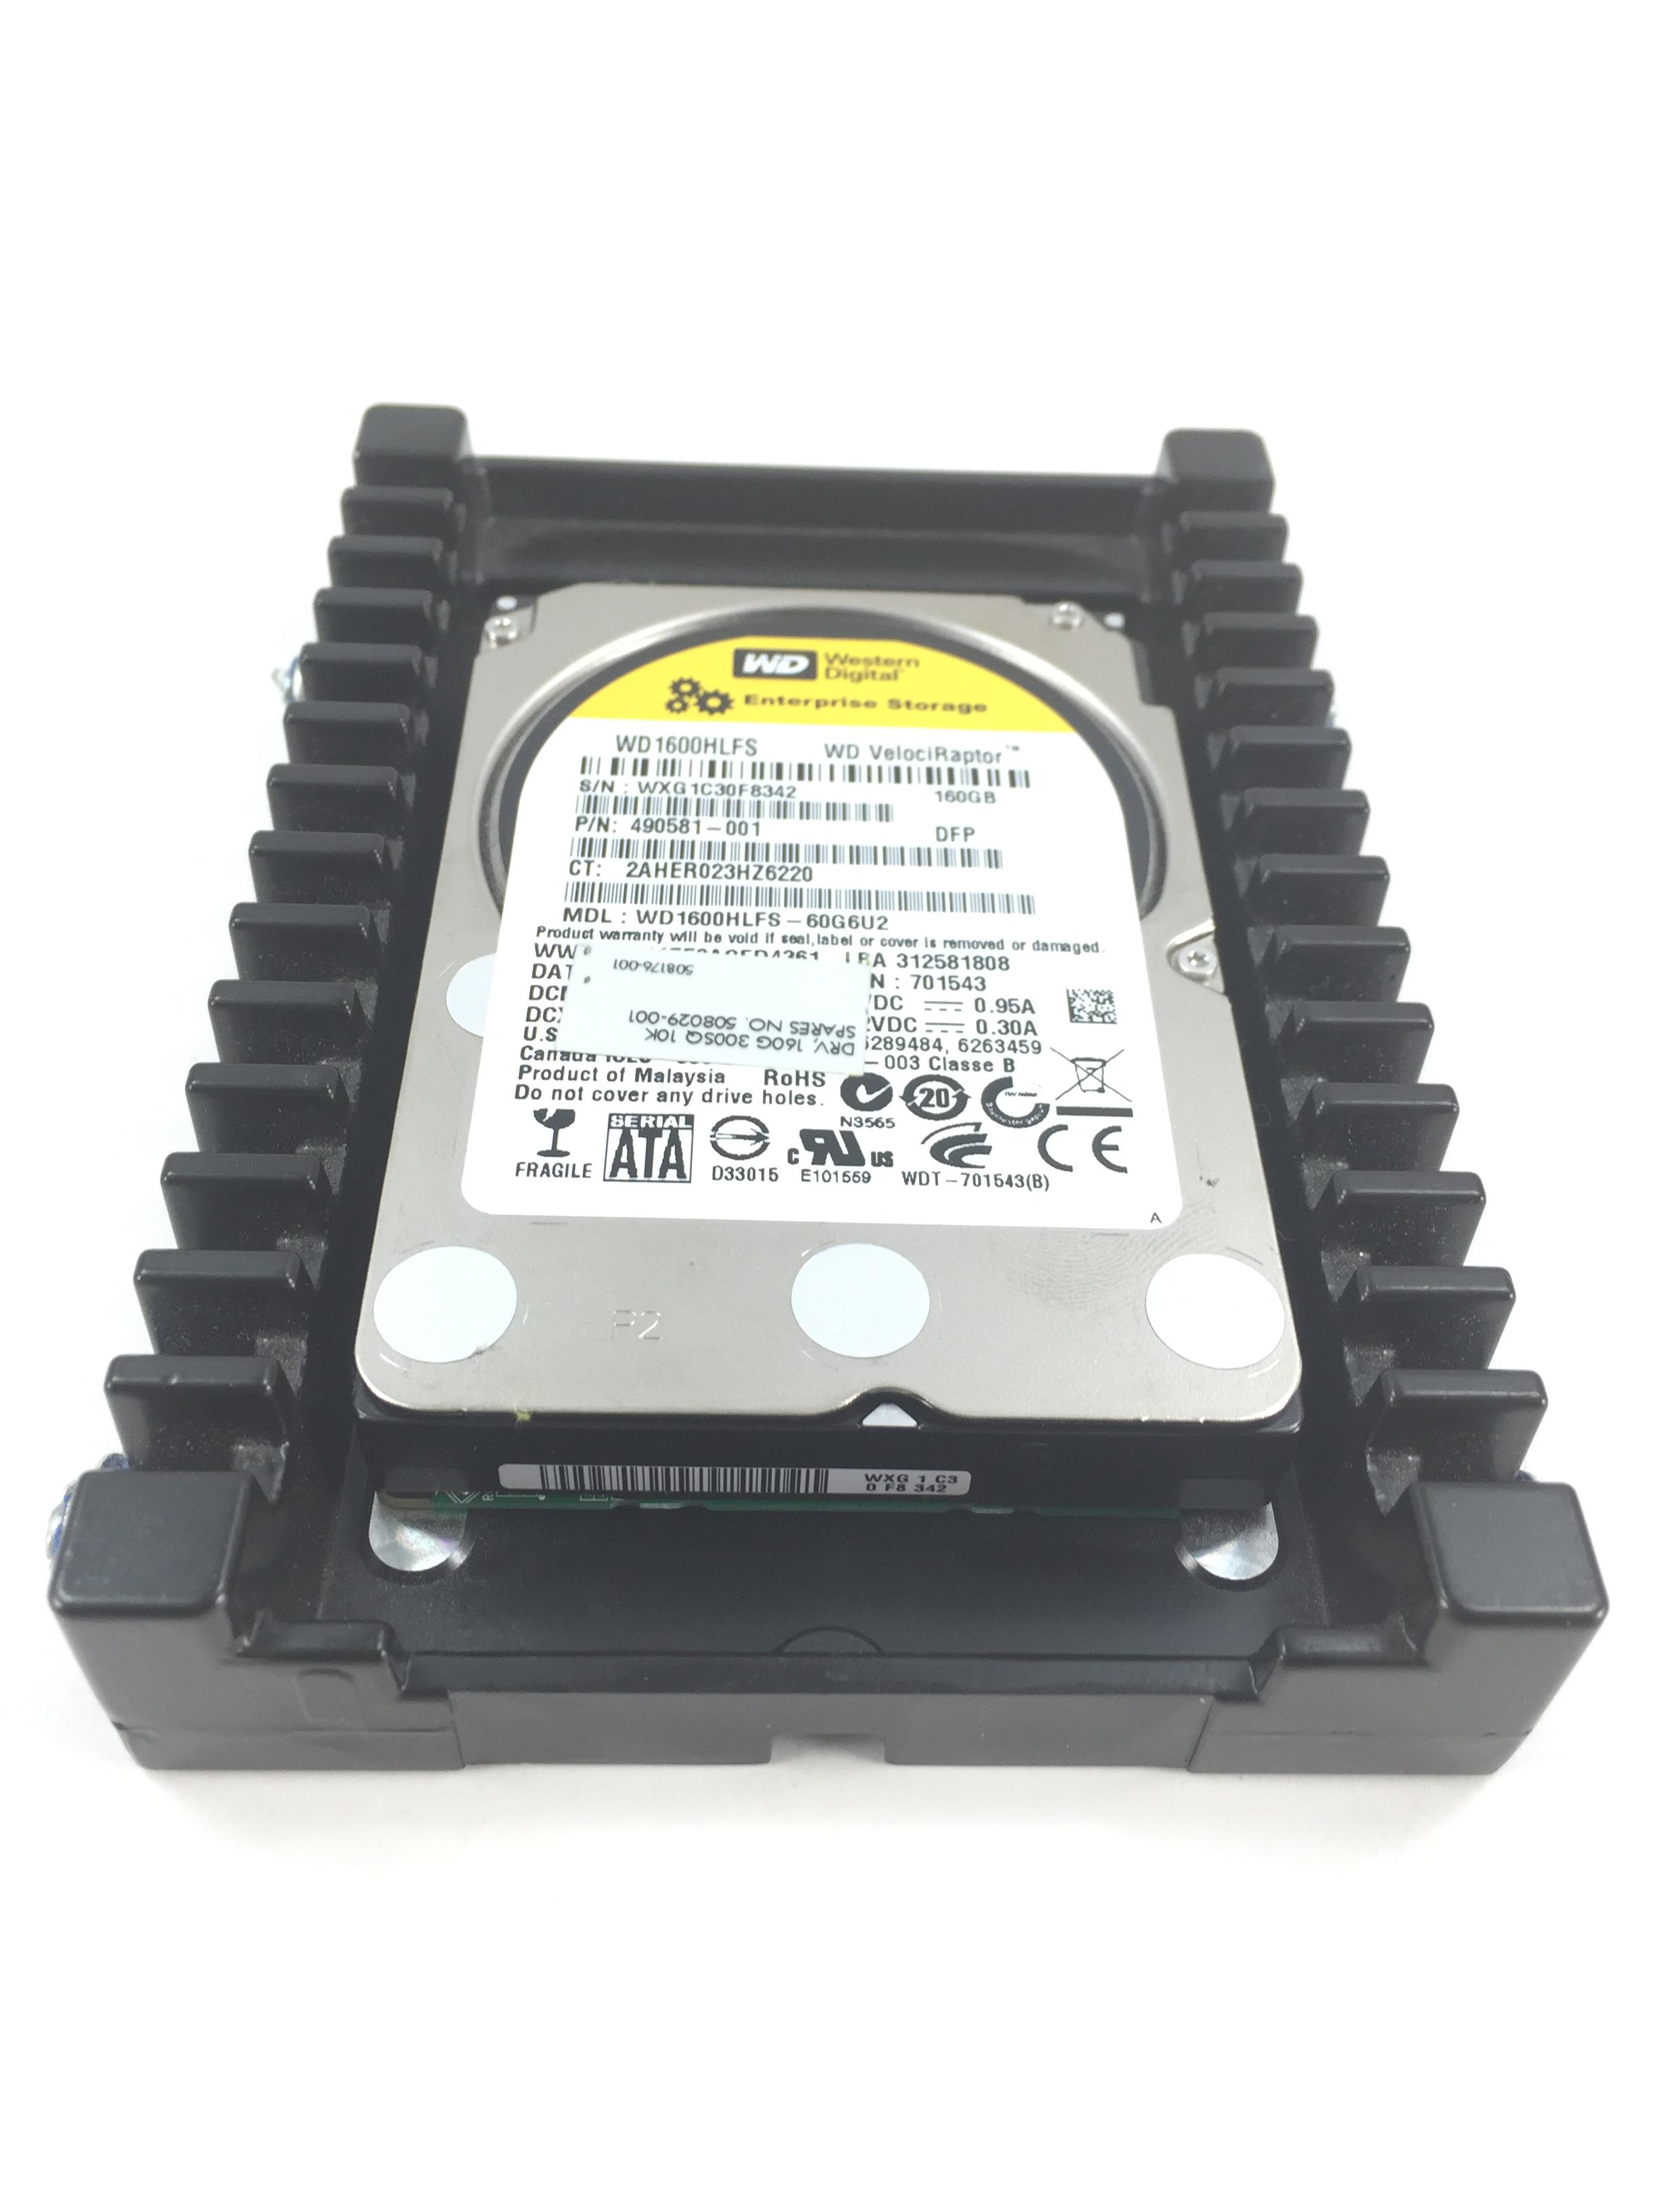 HP Wd Velociraptor 160GB 10K 3Gbps SATA 3.5'' Hard Drive (508029-001)